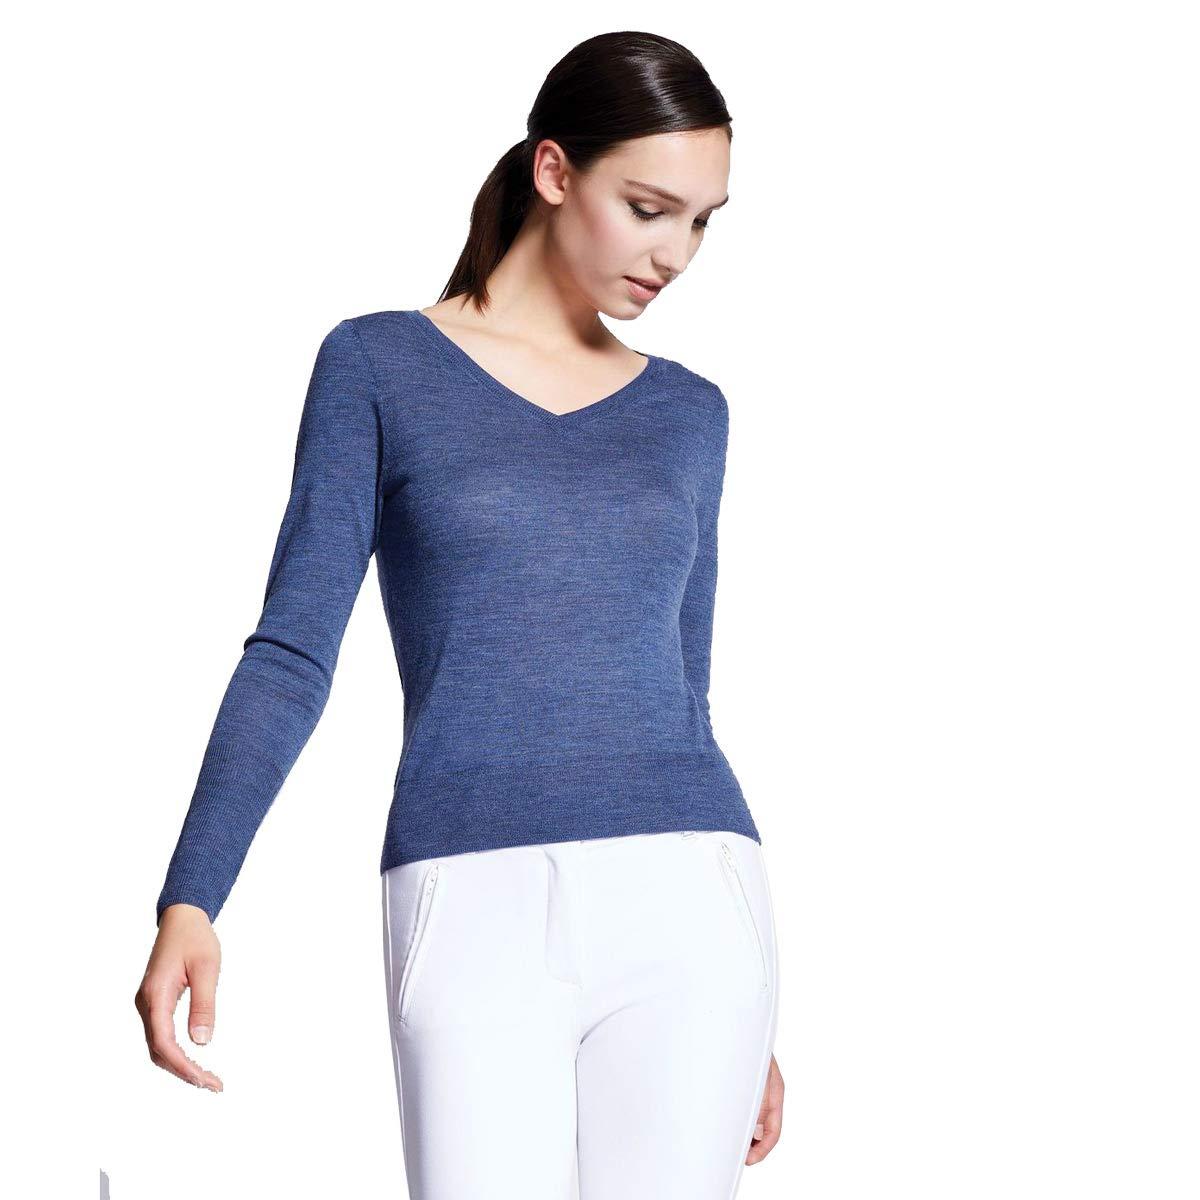 Noel Asmar(ノエルアスマール) Adara V-Neck Merino Sweater アデラVネック メリノセーター ネイビー Sサイズ B07B9MVN6S